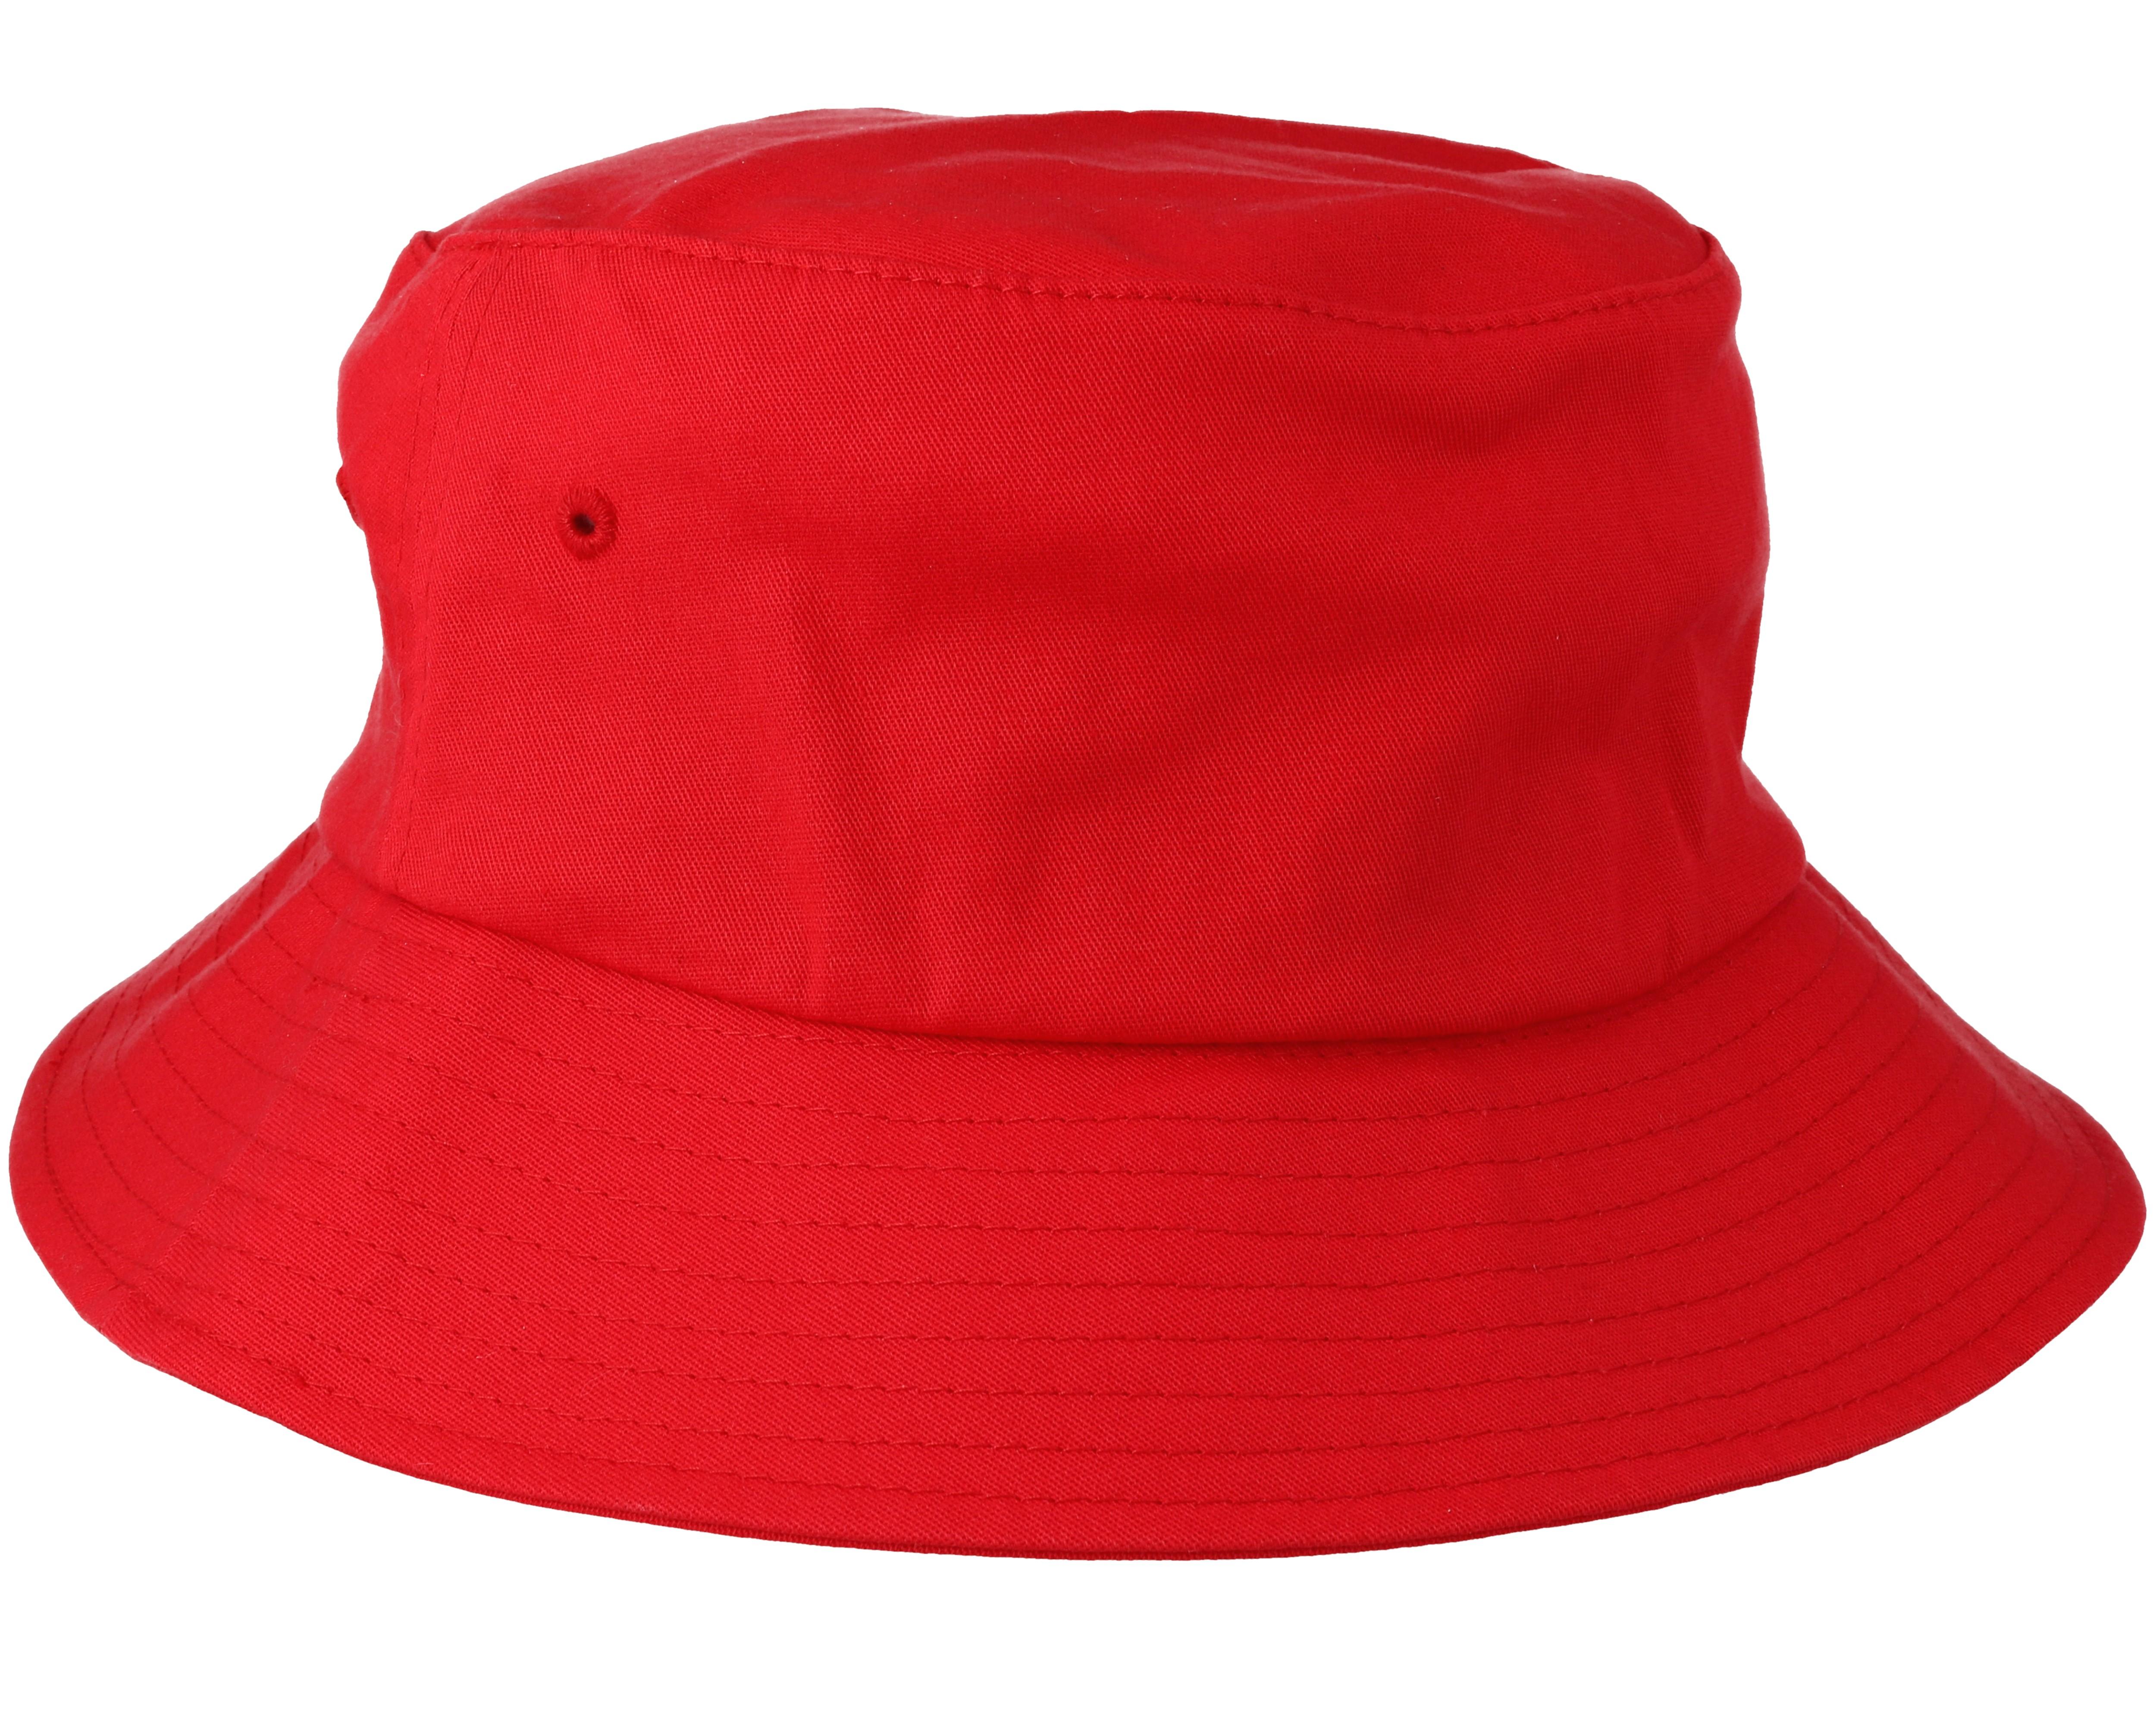 Kangol Bermuda Red Bucket Hat  |Red Bucket Hat